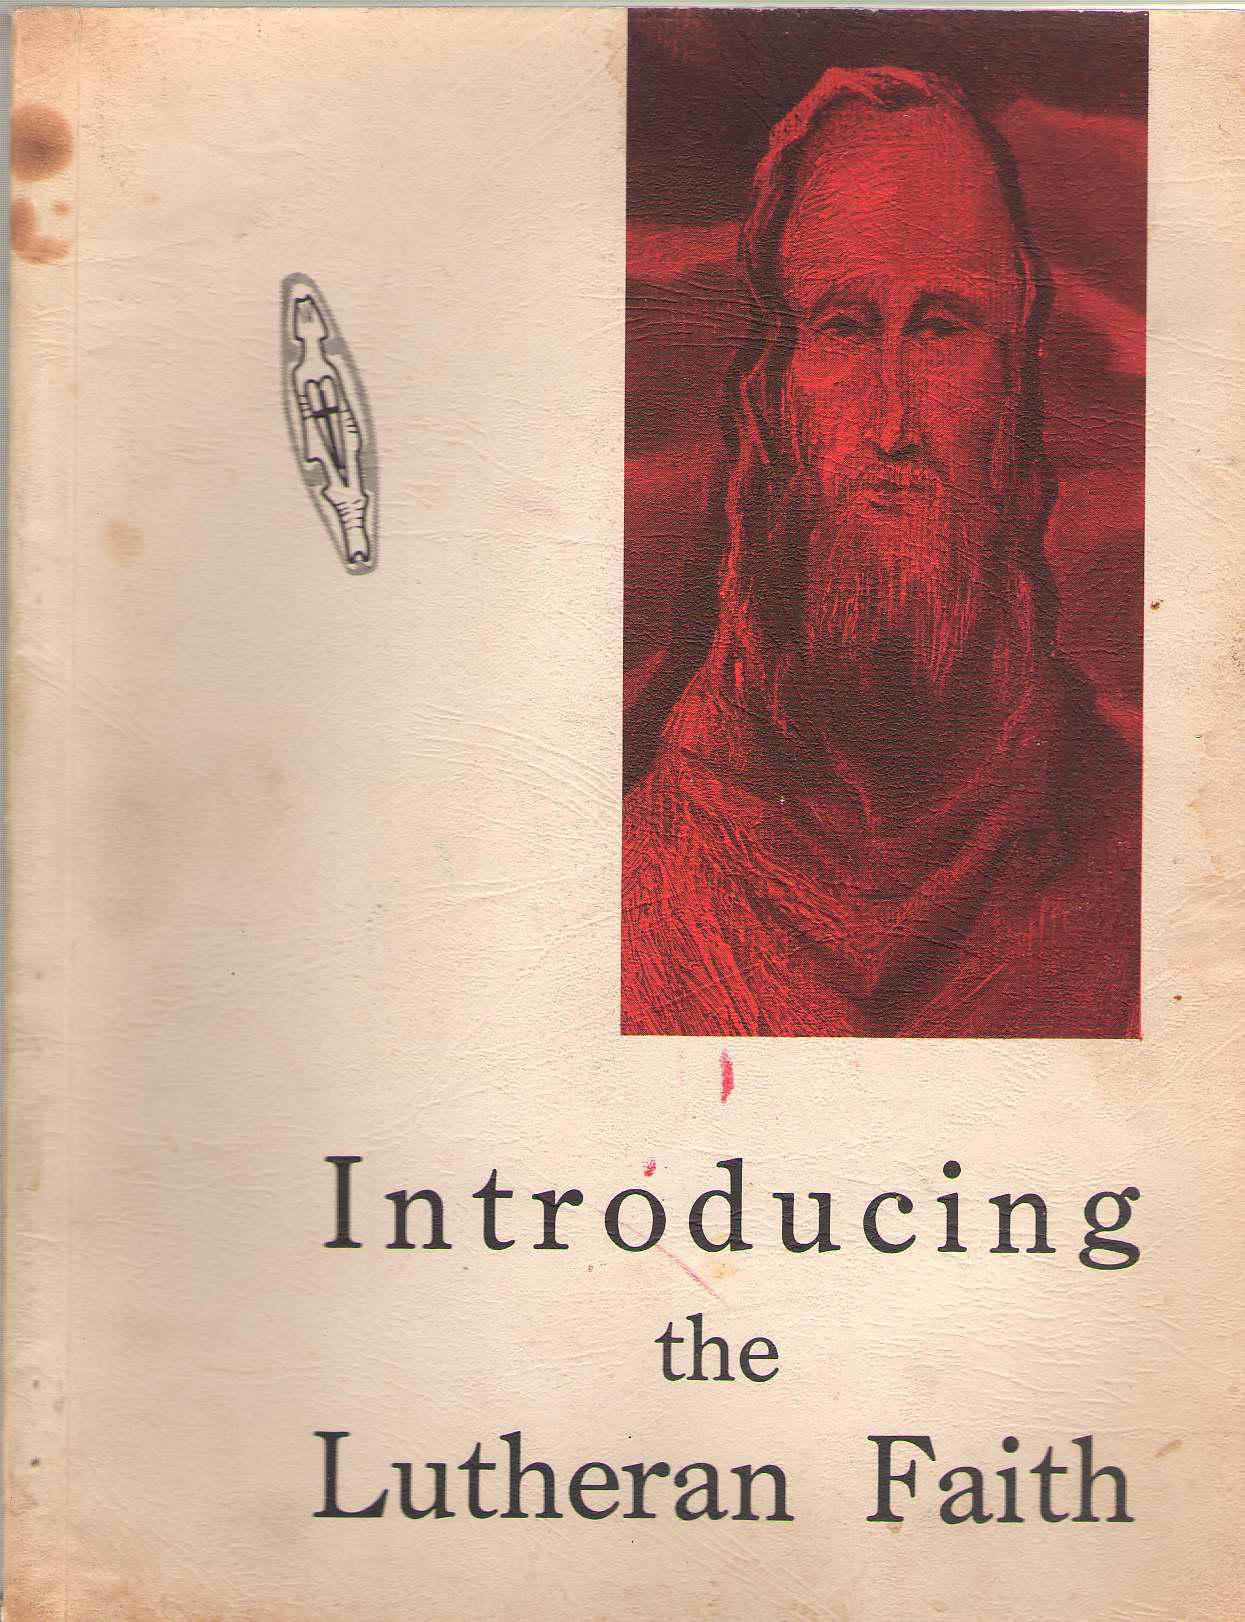 Introducing The Lutheran Faith, Mails, Thomas E.